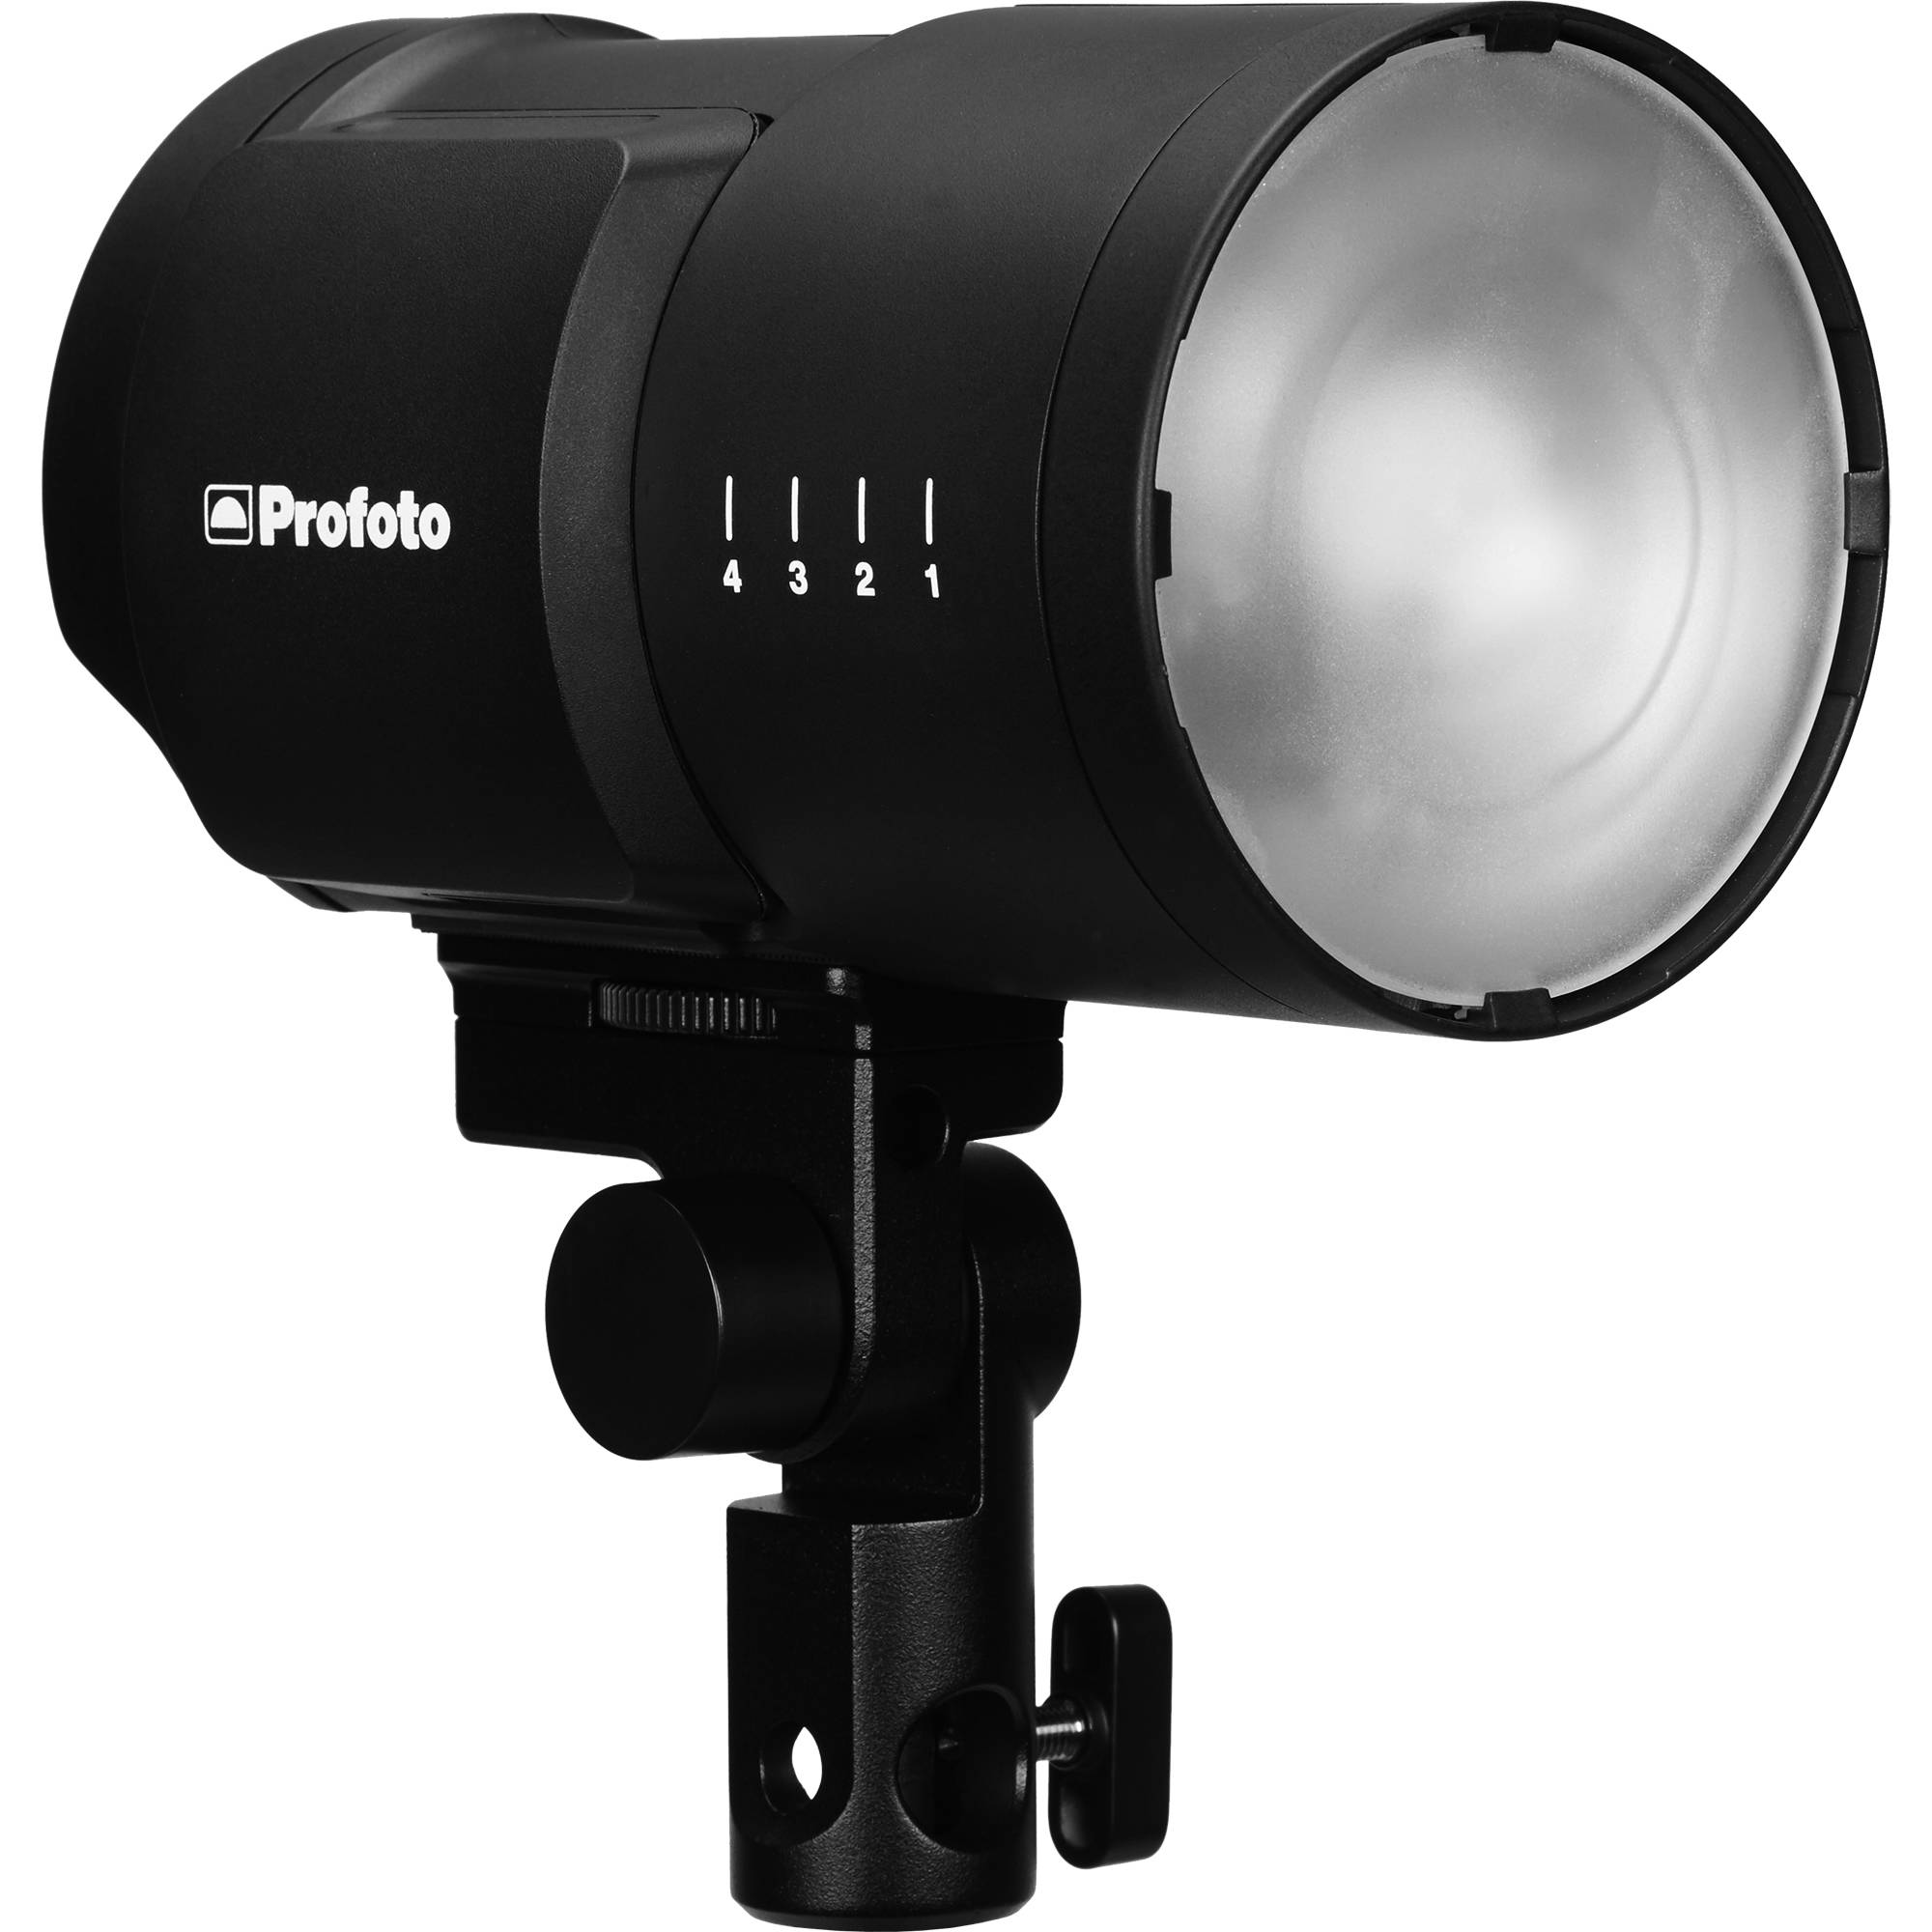 Profoto B10 Ocf Flash Head 901163 Bh Photo Video Camera Circuit Further Disposable